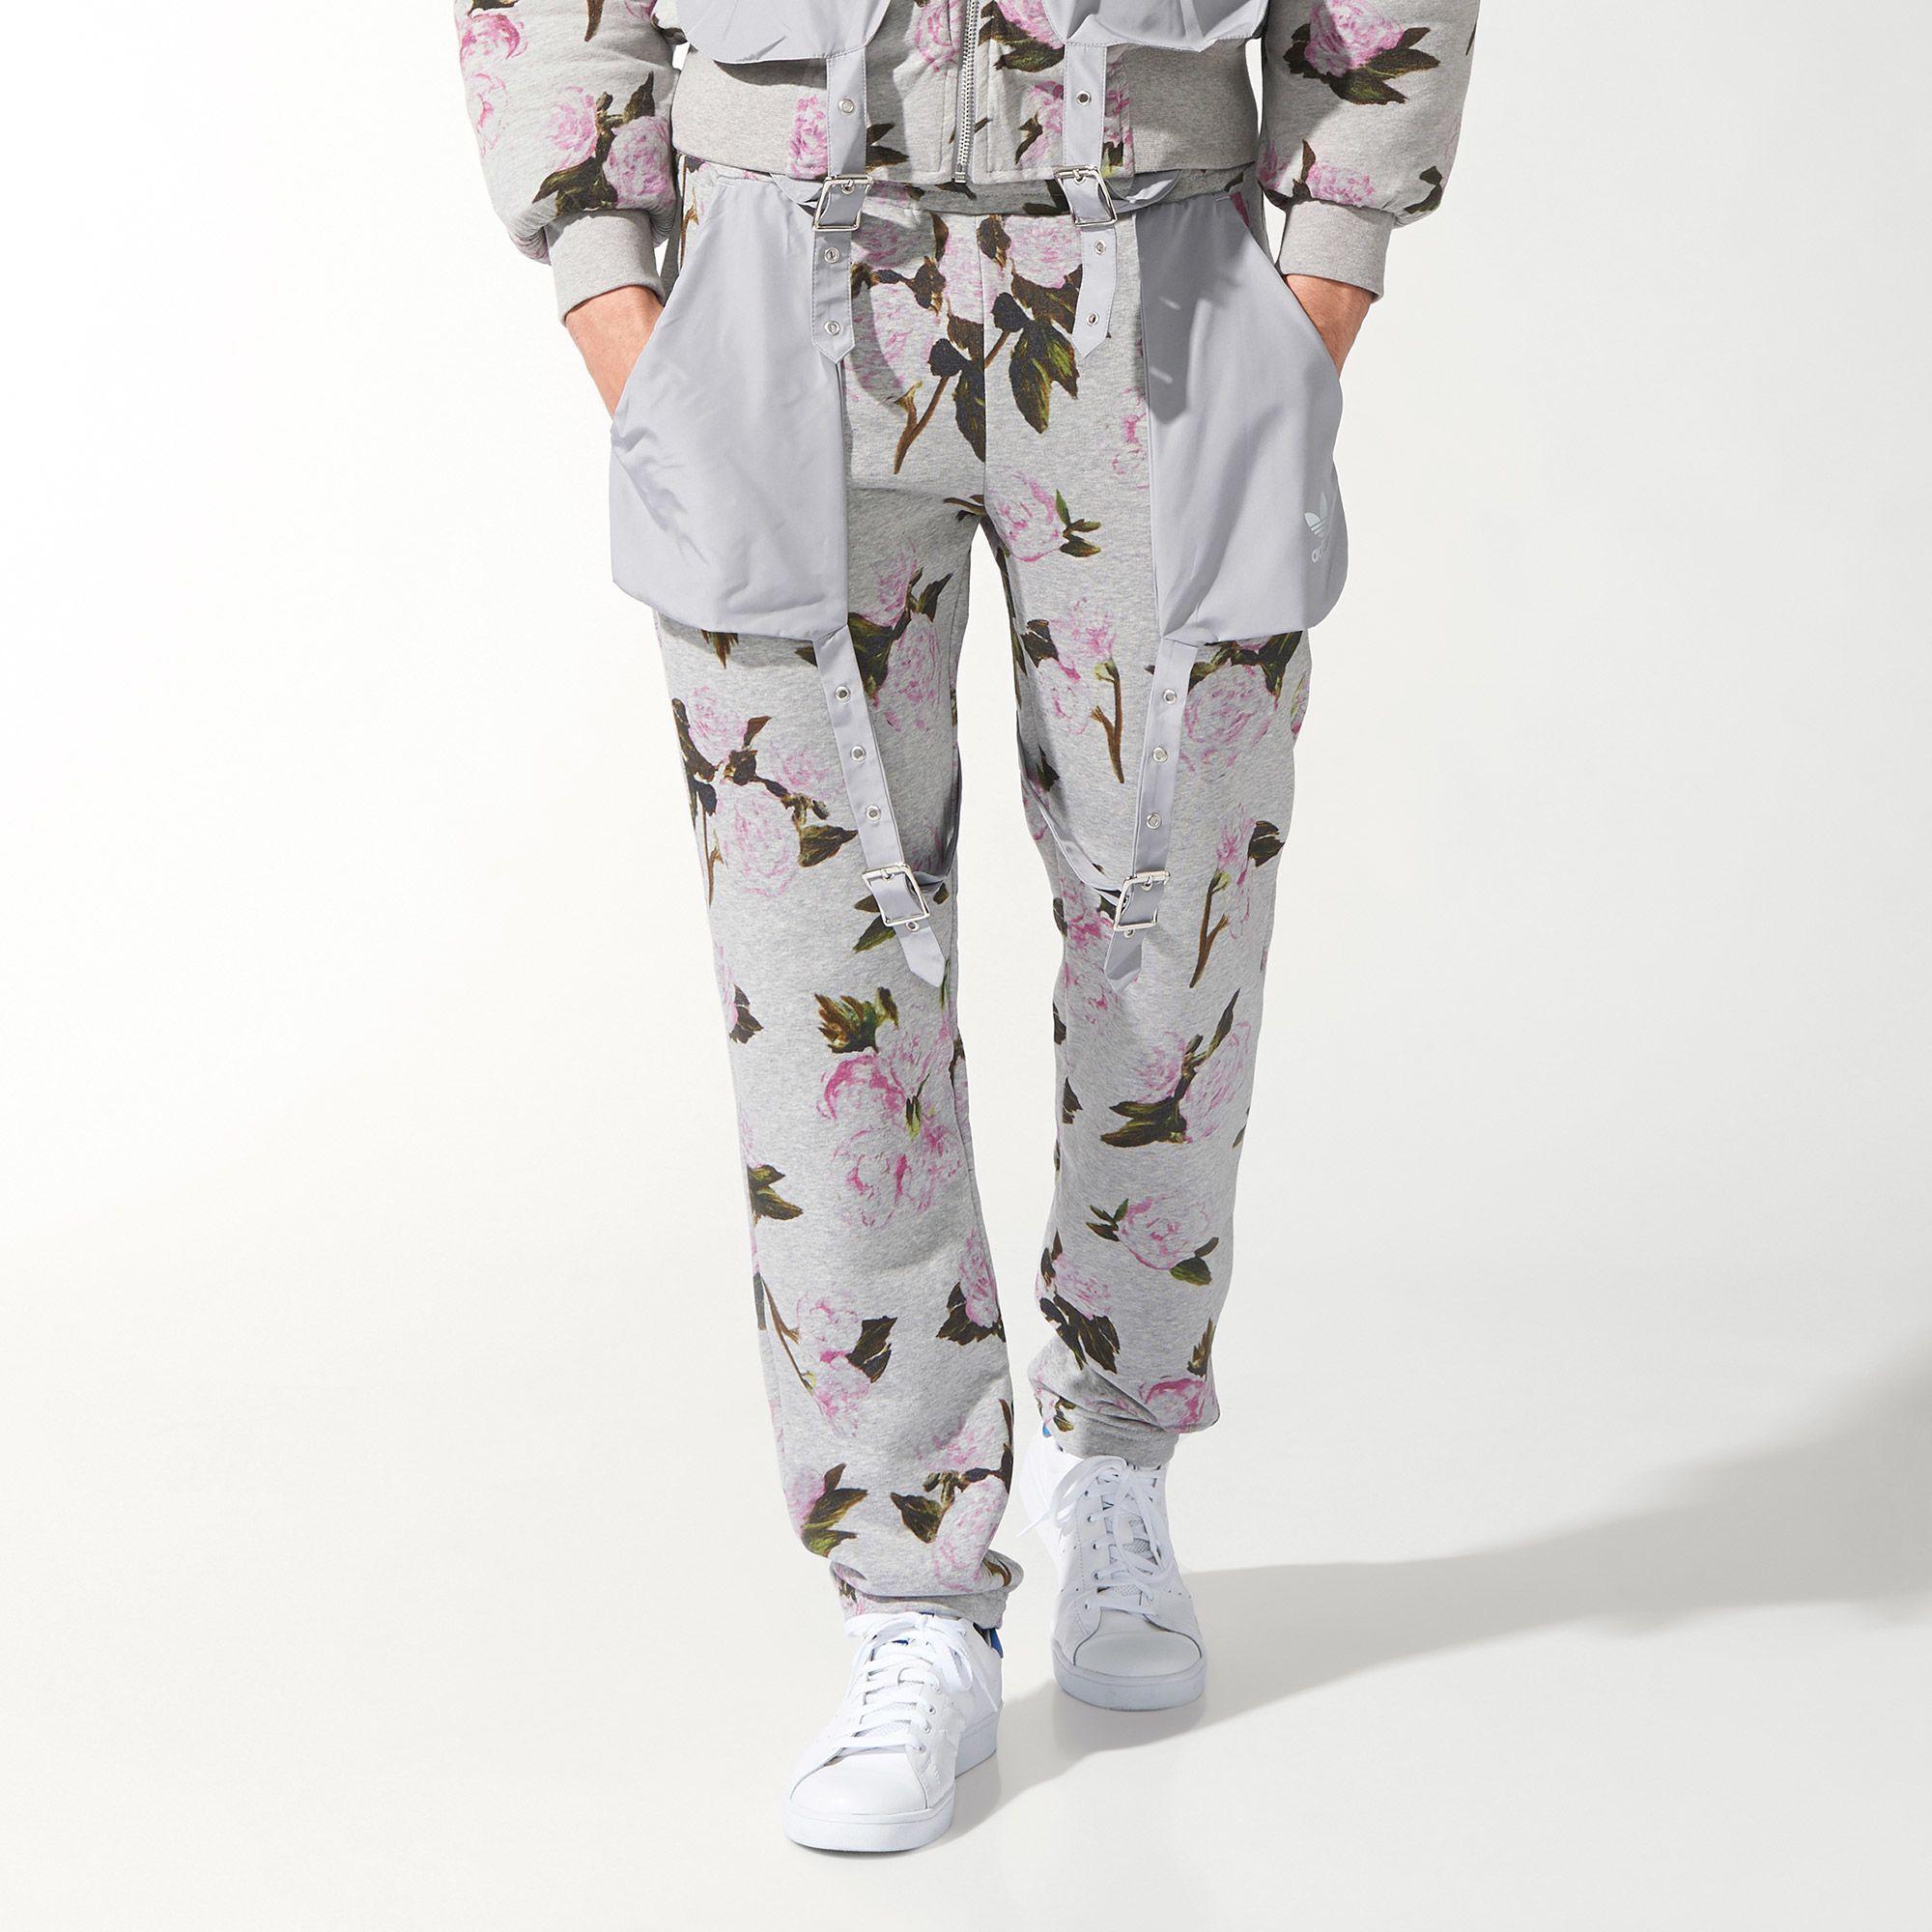 Running Pants Floral Horizontal Adidas Pinterest Track qIwzgzER